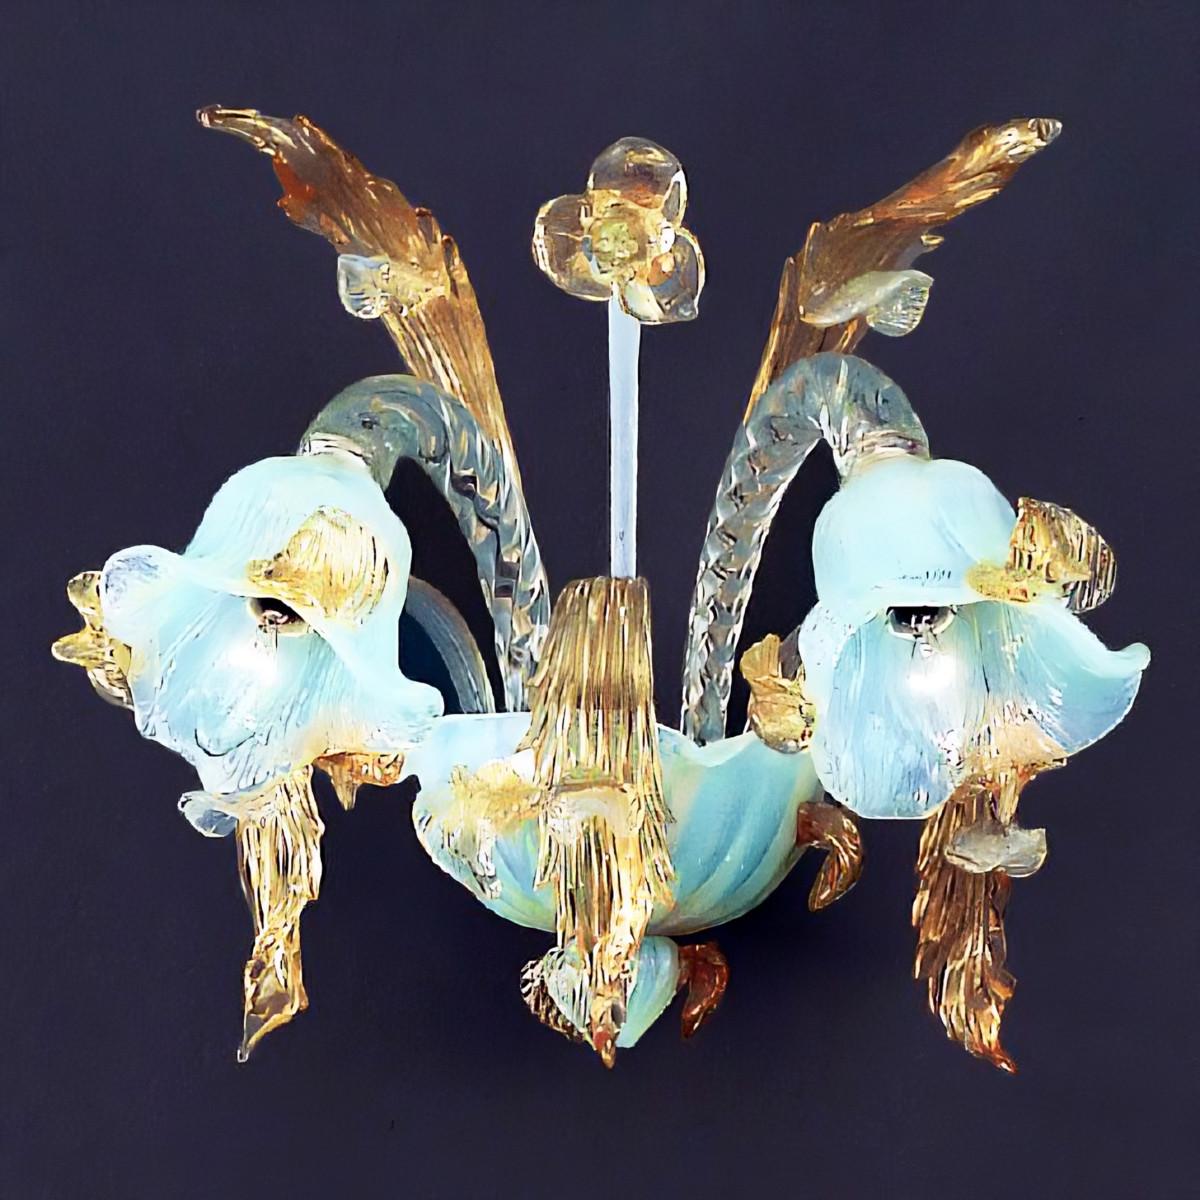 Vivaldi 2 lumieres applique Murano - couleur opale or